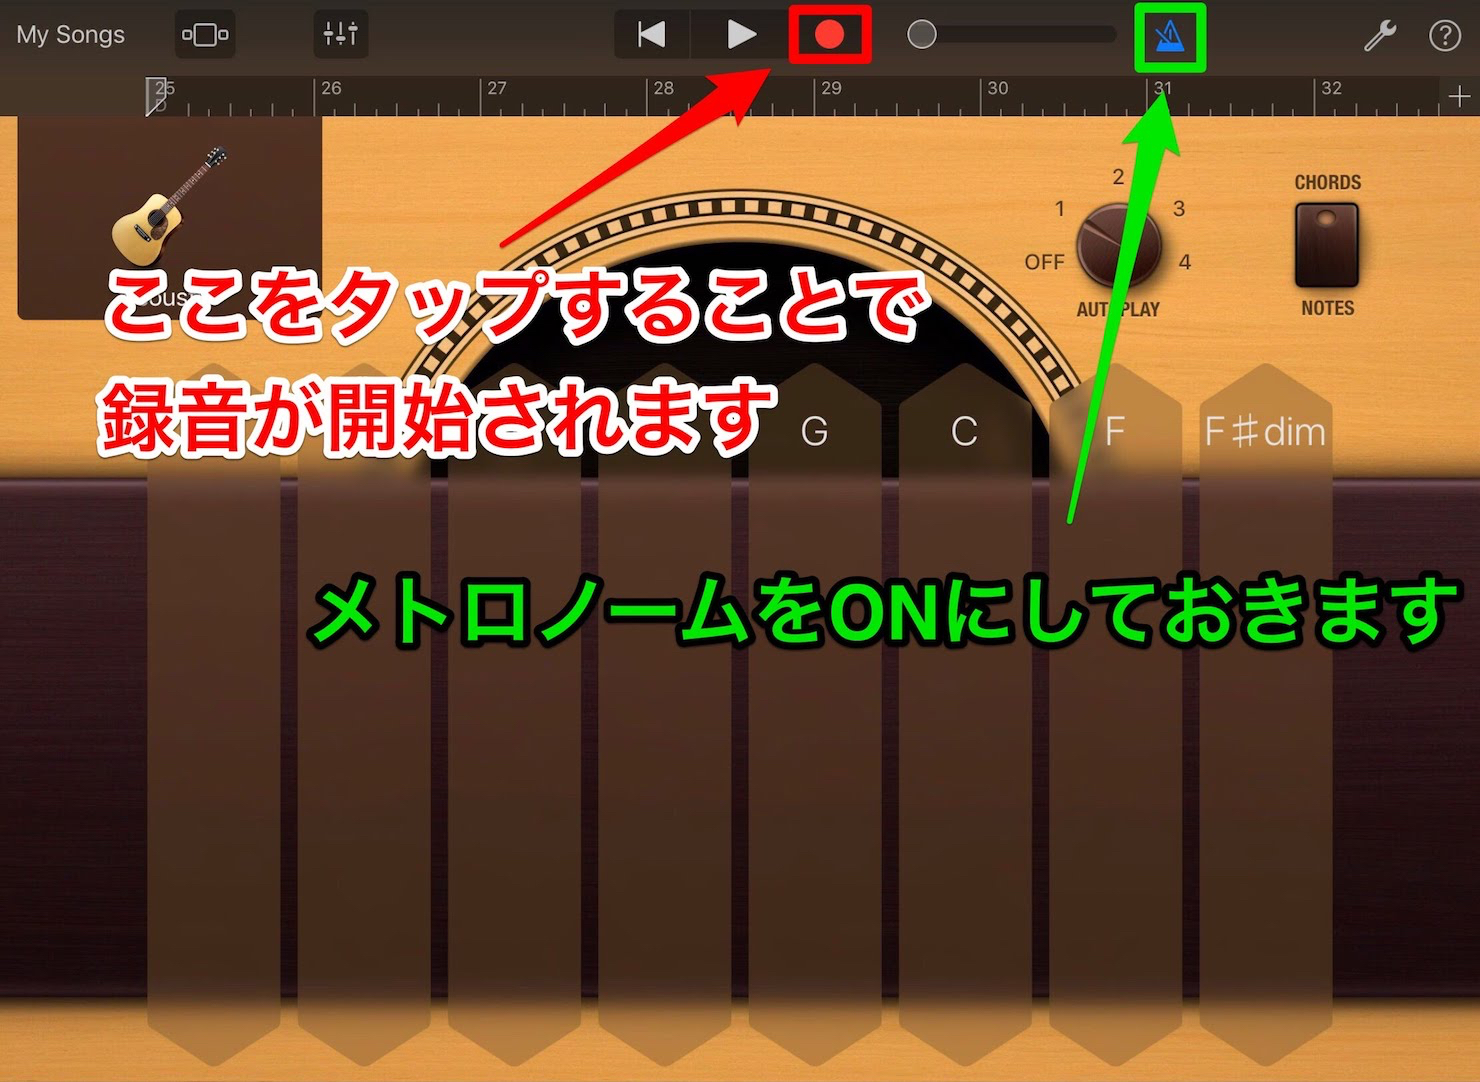 GarageBand-iOS-2-4-2Guitar-2